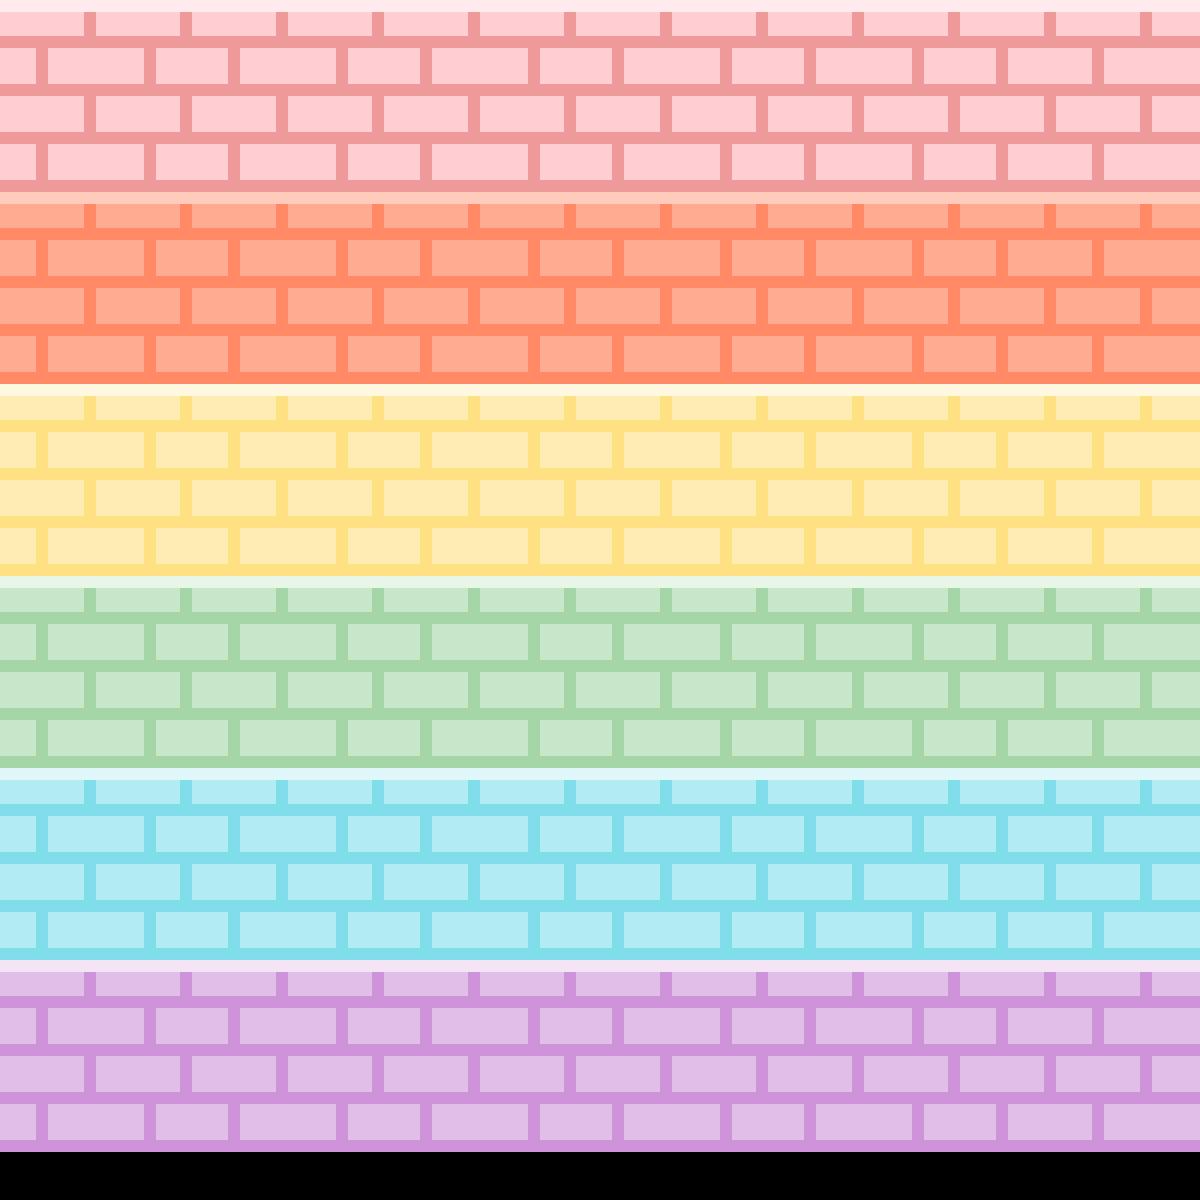 ~ Pastel Brick ~ by Nathicha-Miki15